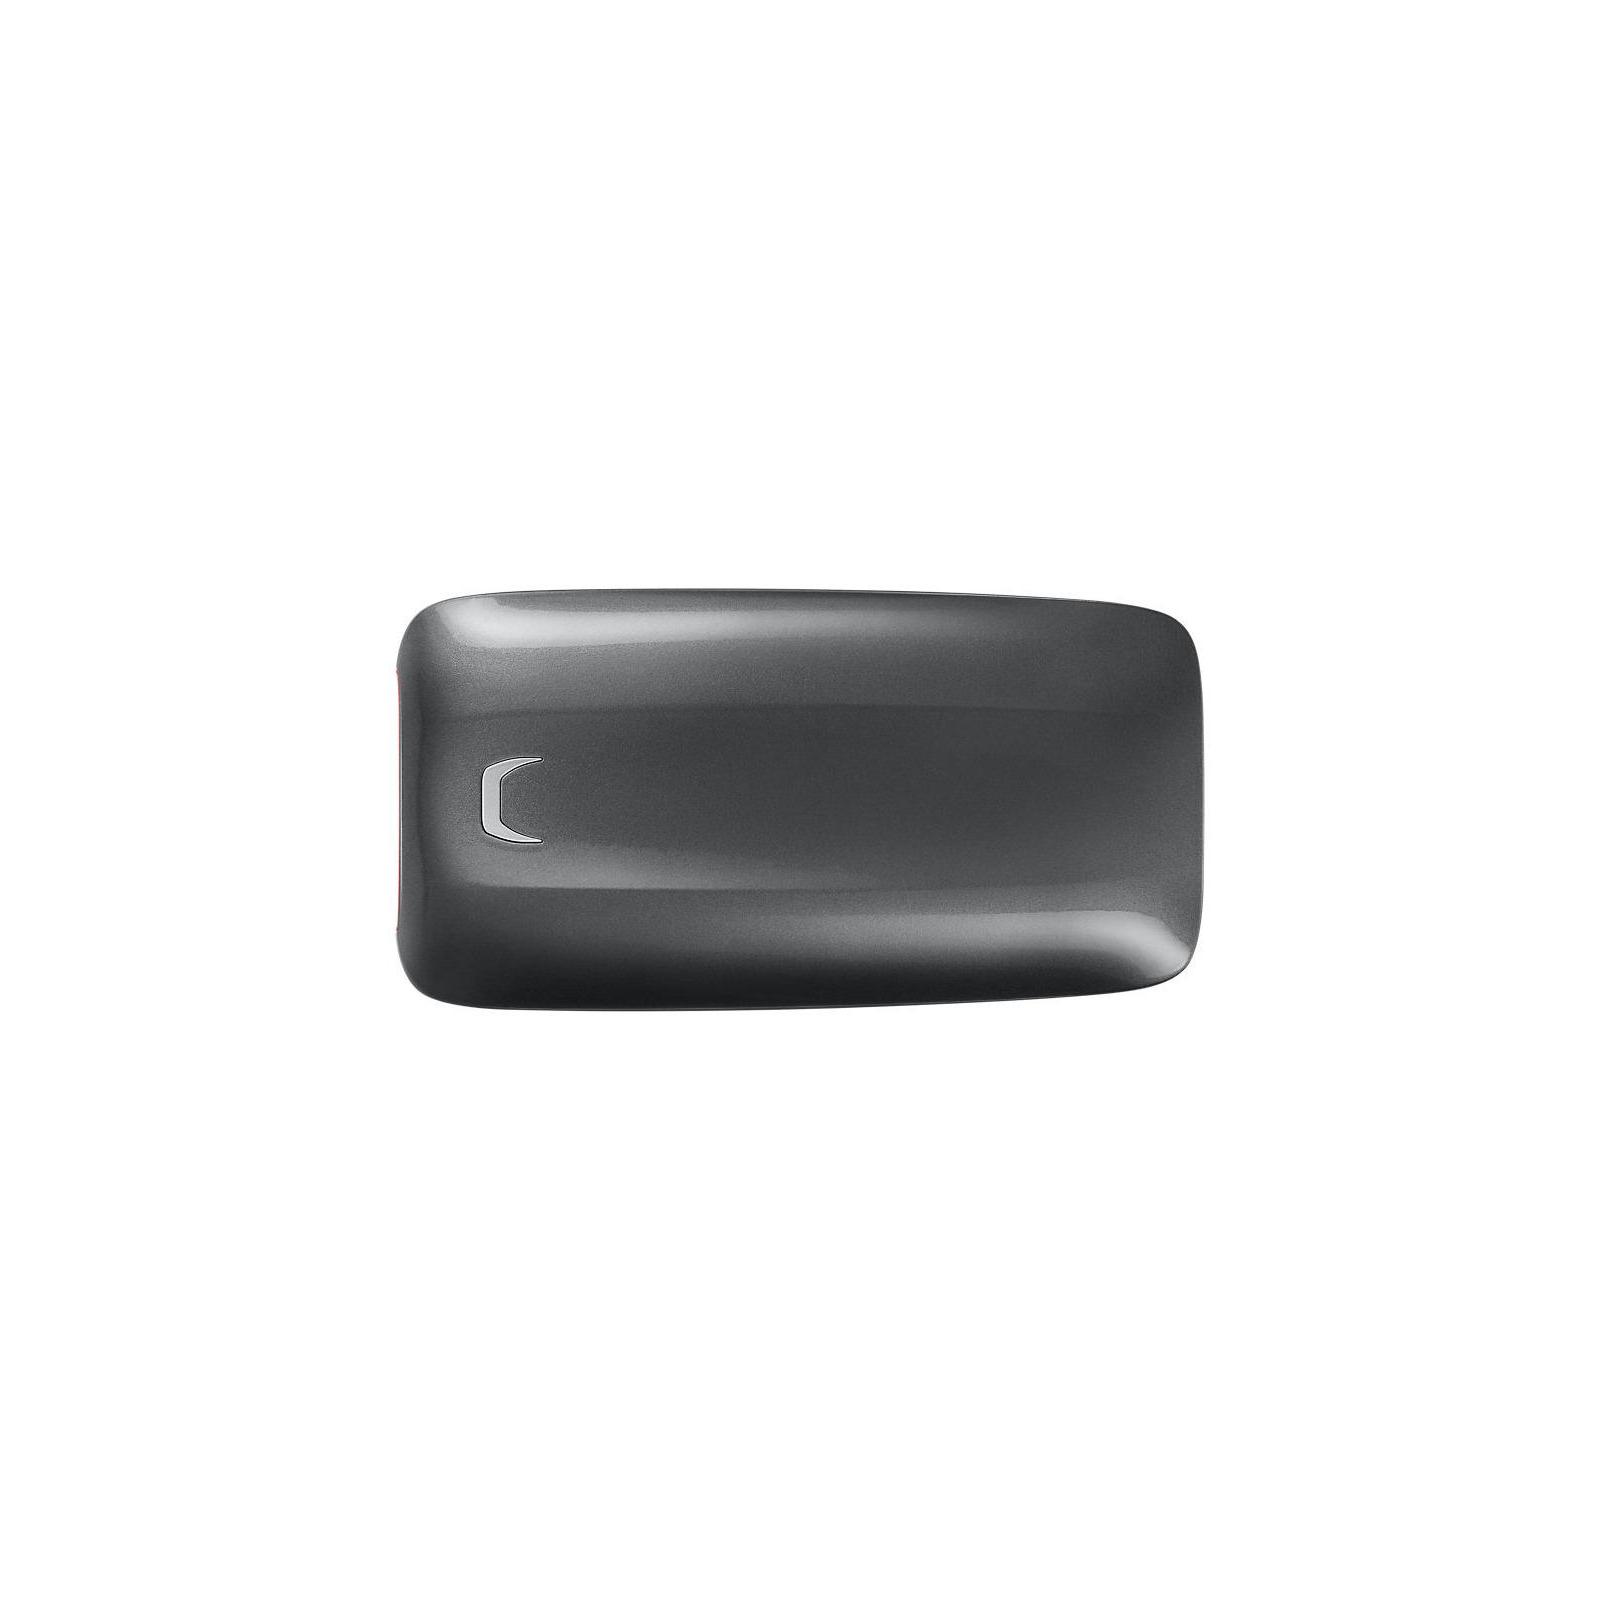 Накопитель SSD USB 3.1 1TB Samsung (MU-PB1T0B/WW)